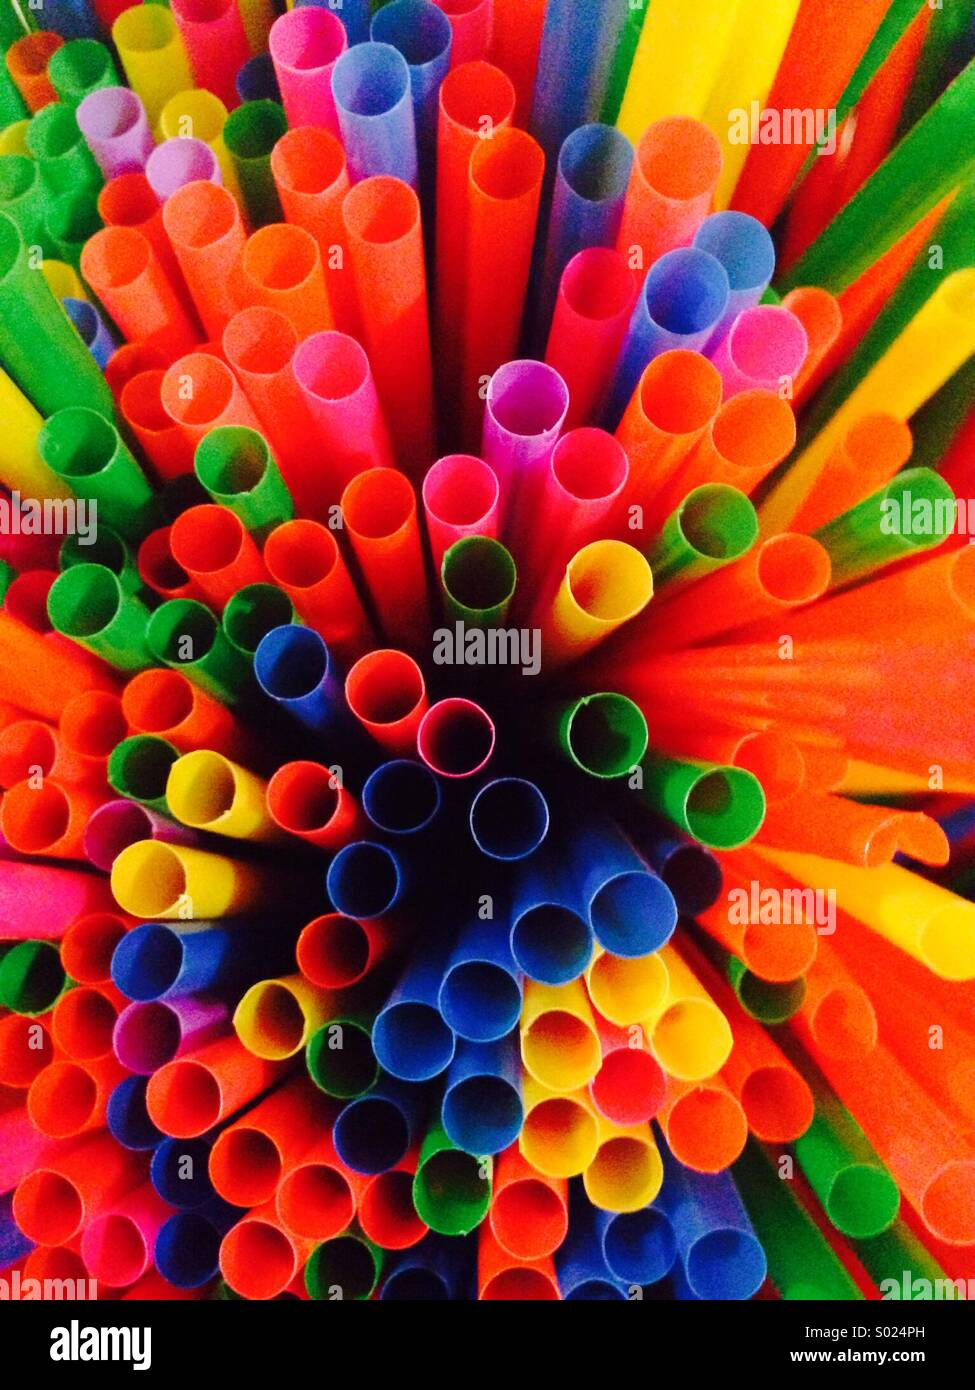 Strohhalme Dofferent Farben Stockbild